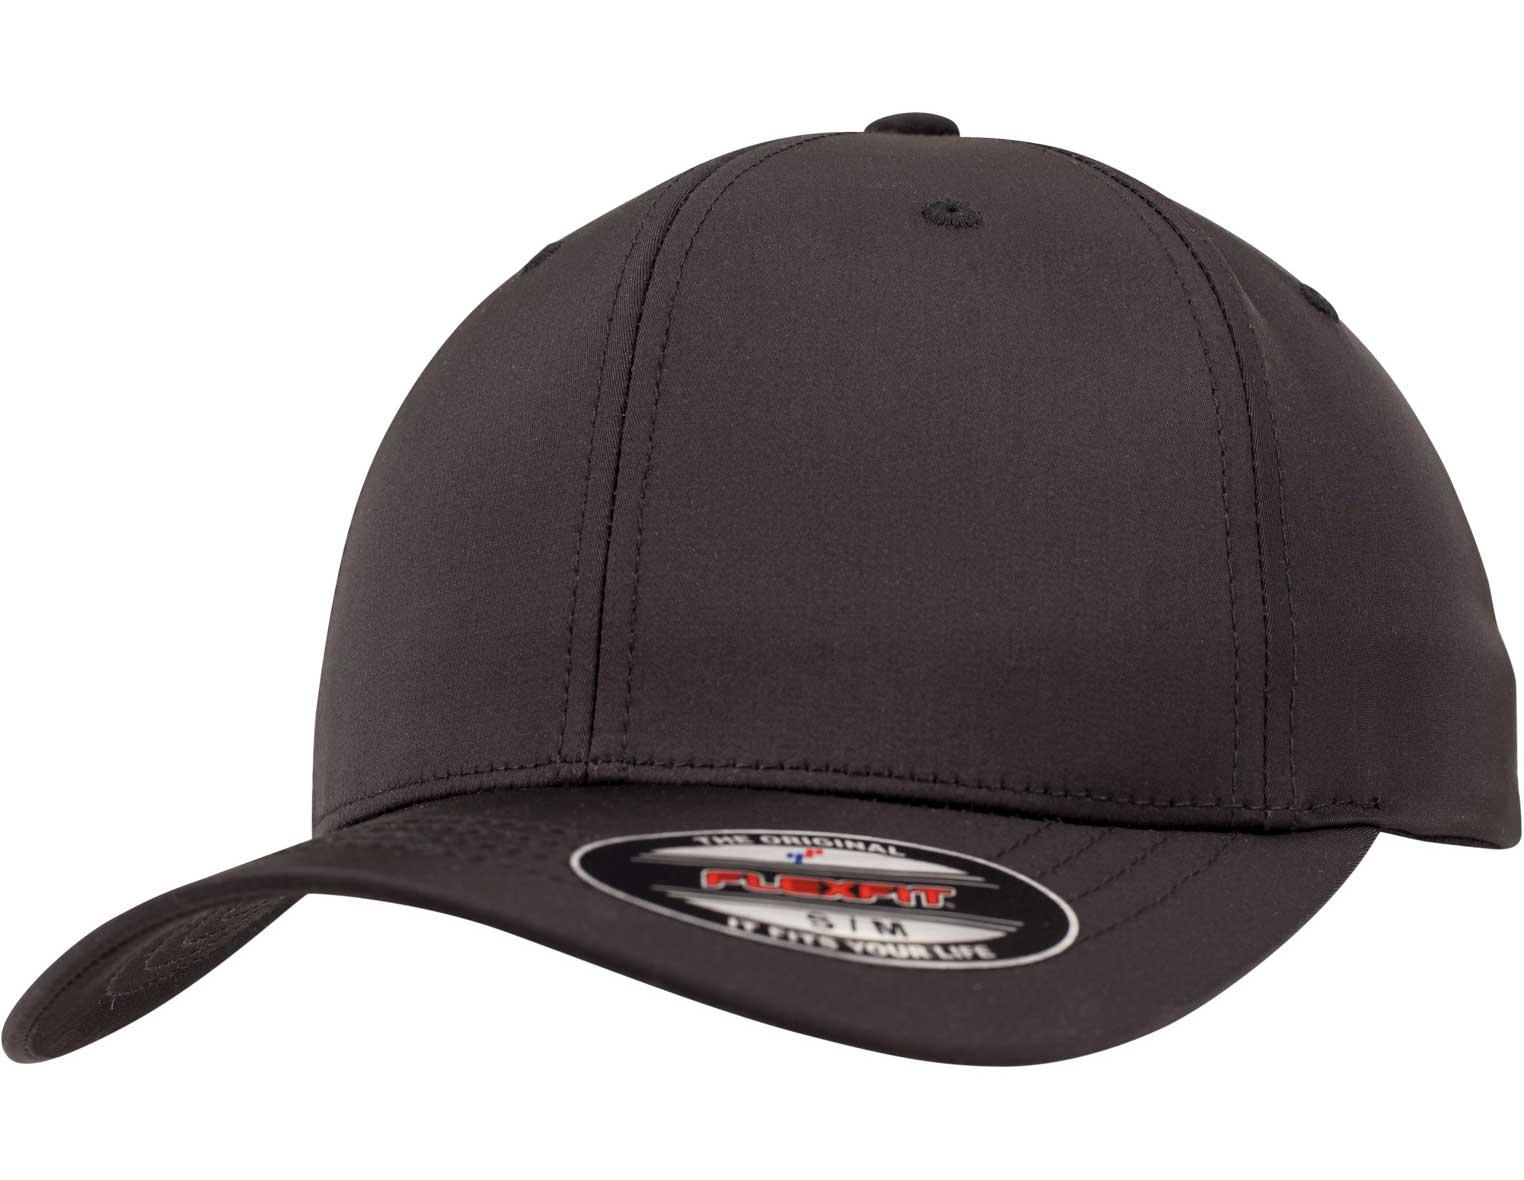 konny design tech flexfit caps personalisieren das allwetter cap selber gestalten. Black Bedroom Furniture Sets. Home Design Ideas